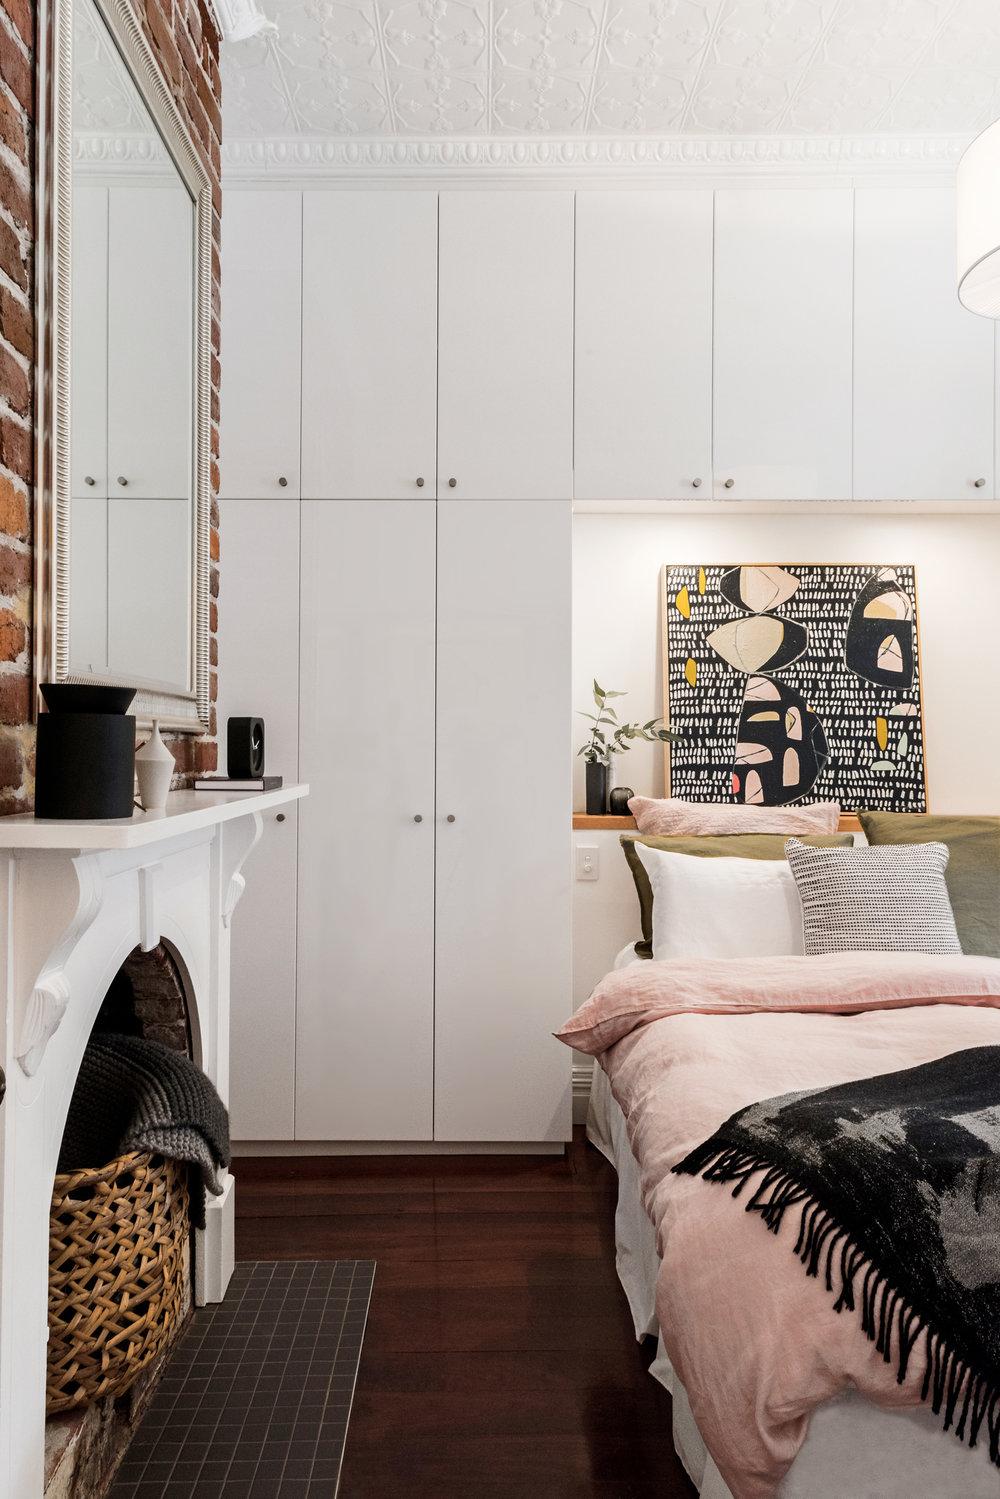 Bedroom wardrobe photograph